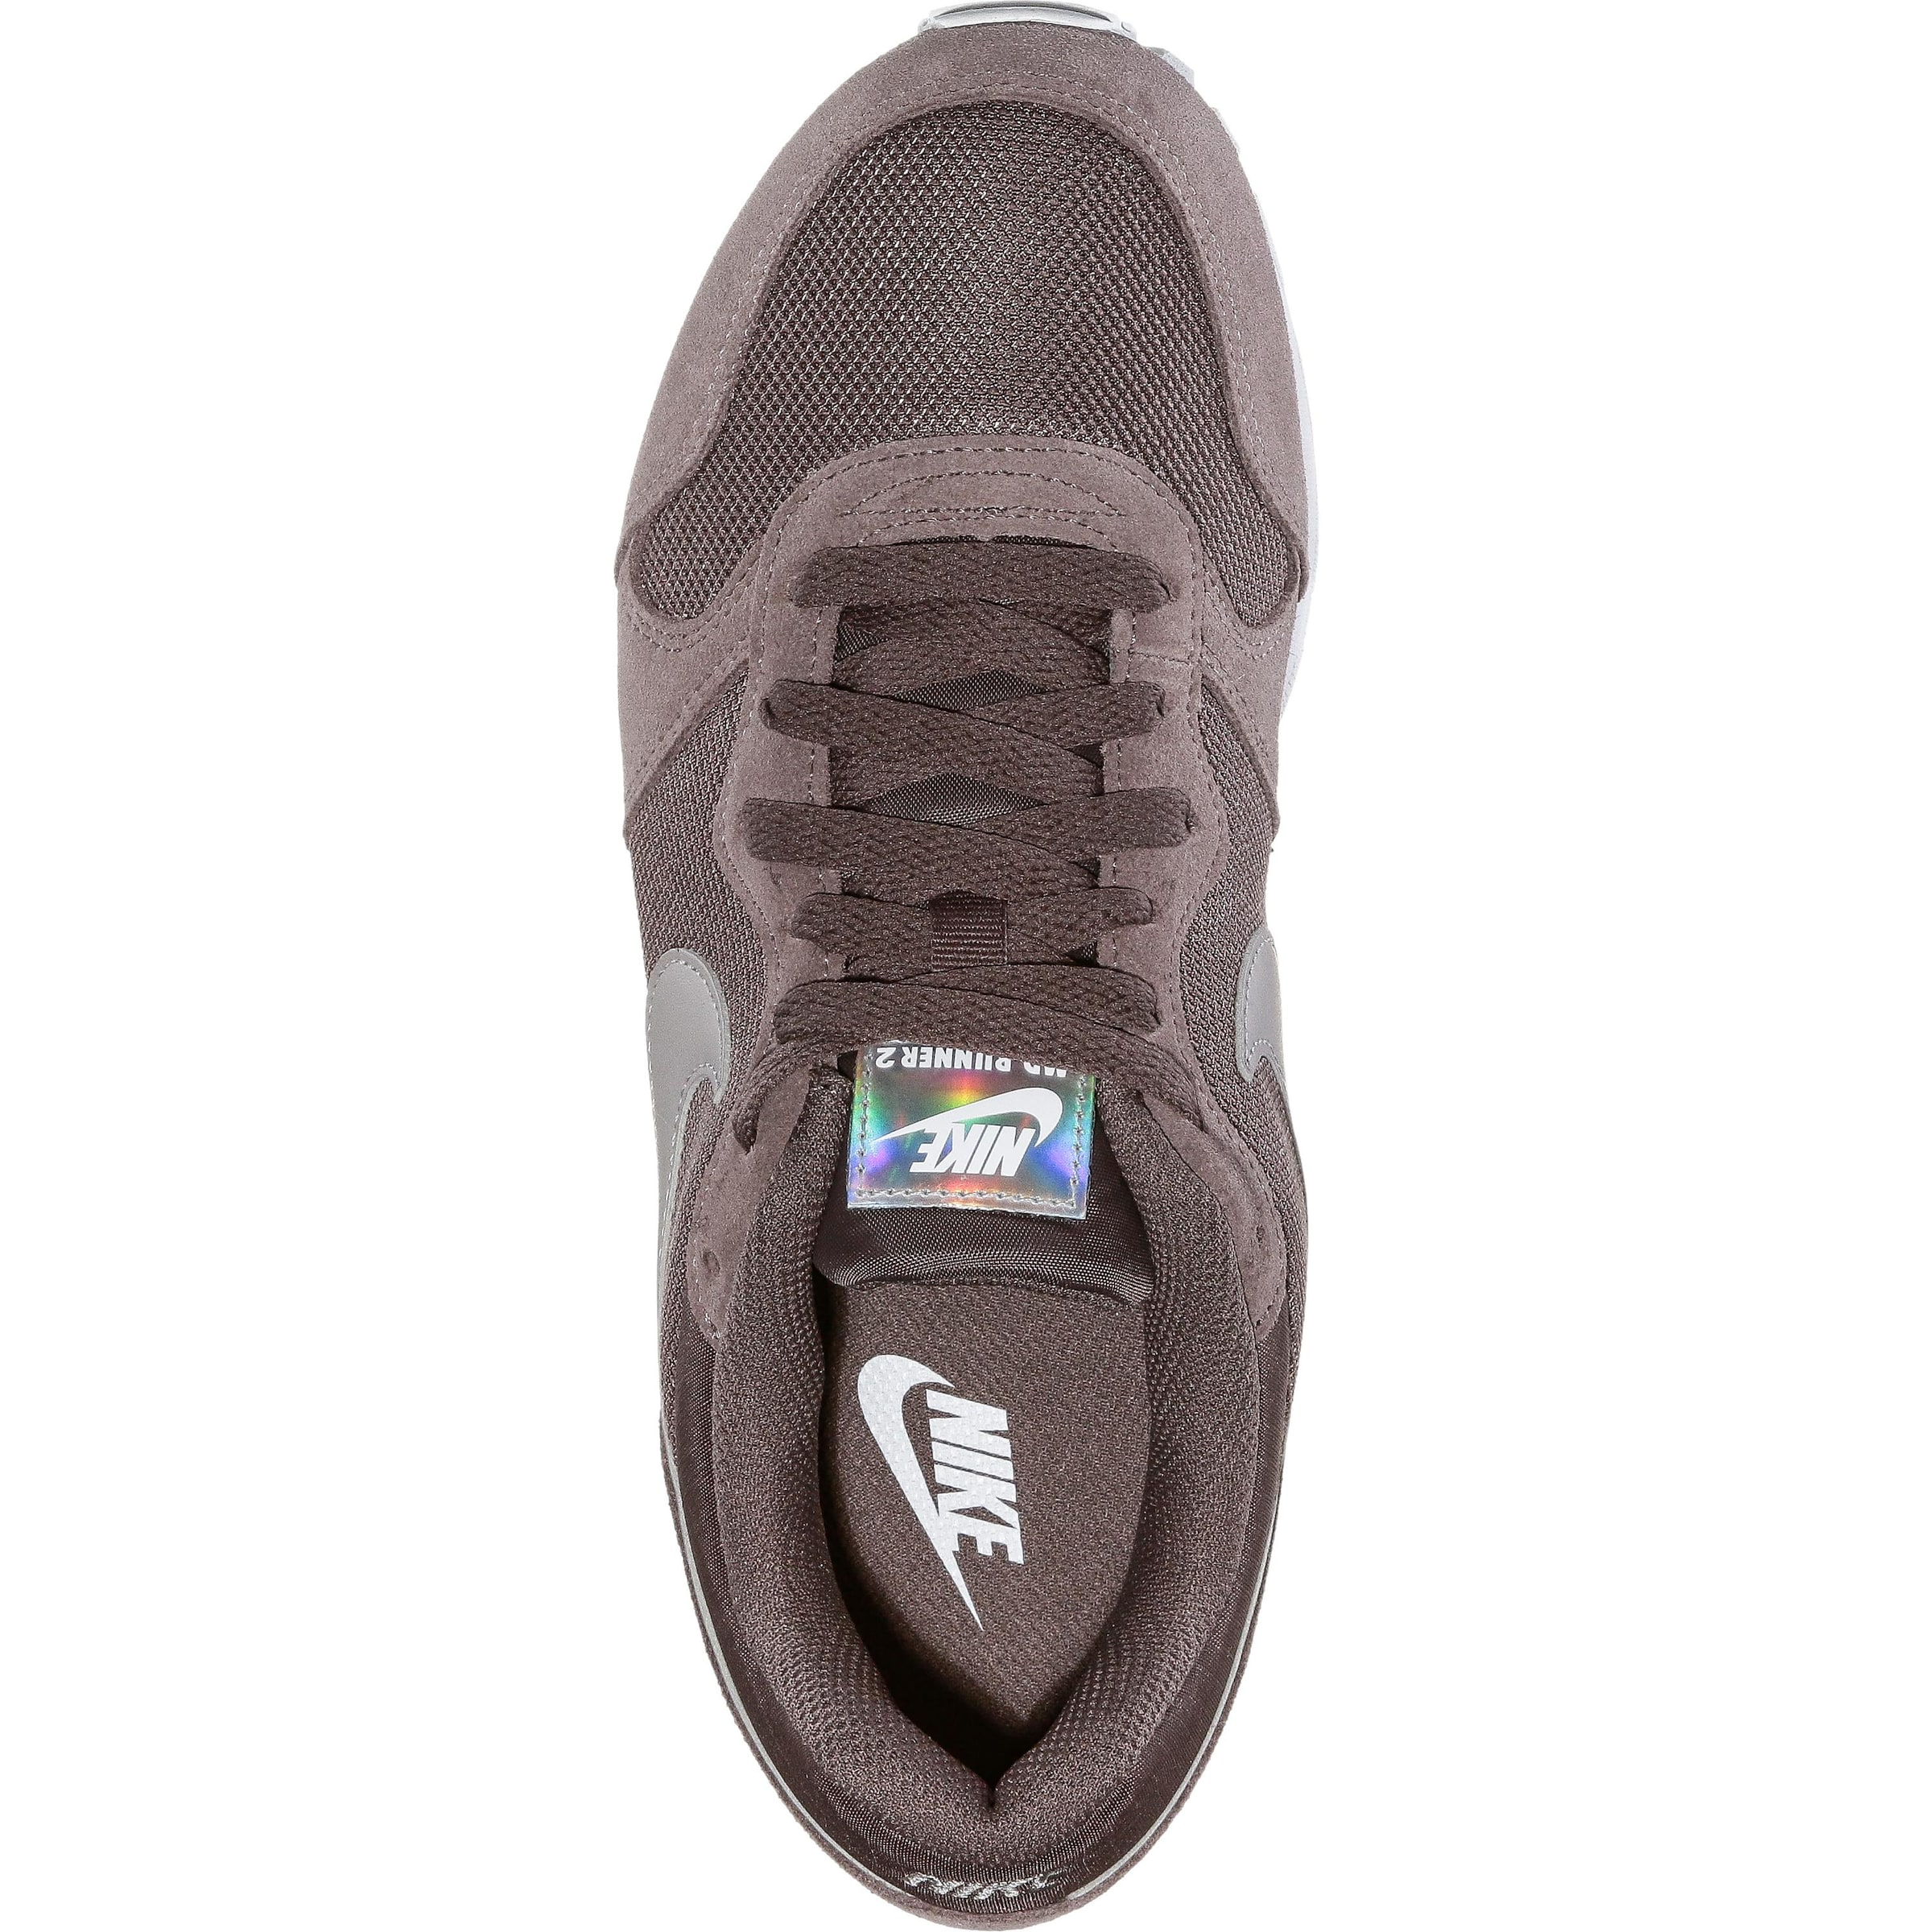 Nike Sportswear Sportswear Sportswear Turnschuhe 'Runner 2 Leder, Textil Bequem, gut aussehend be9dd2